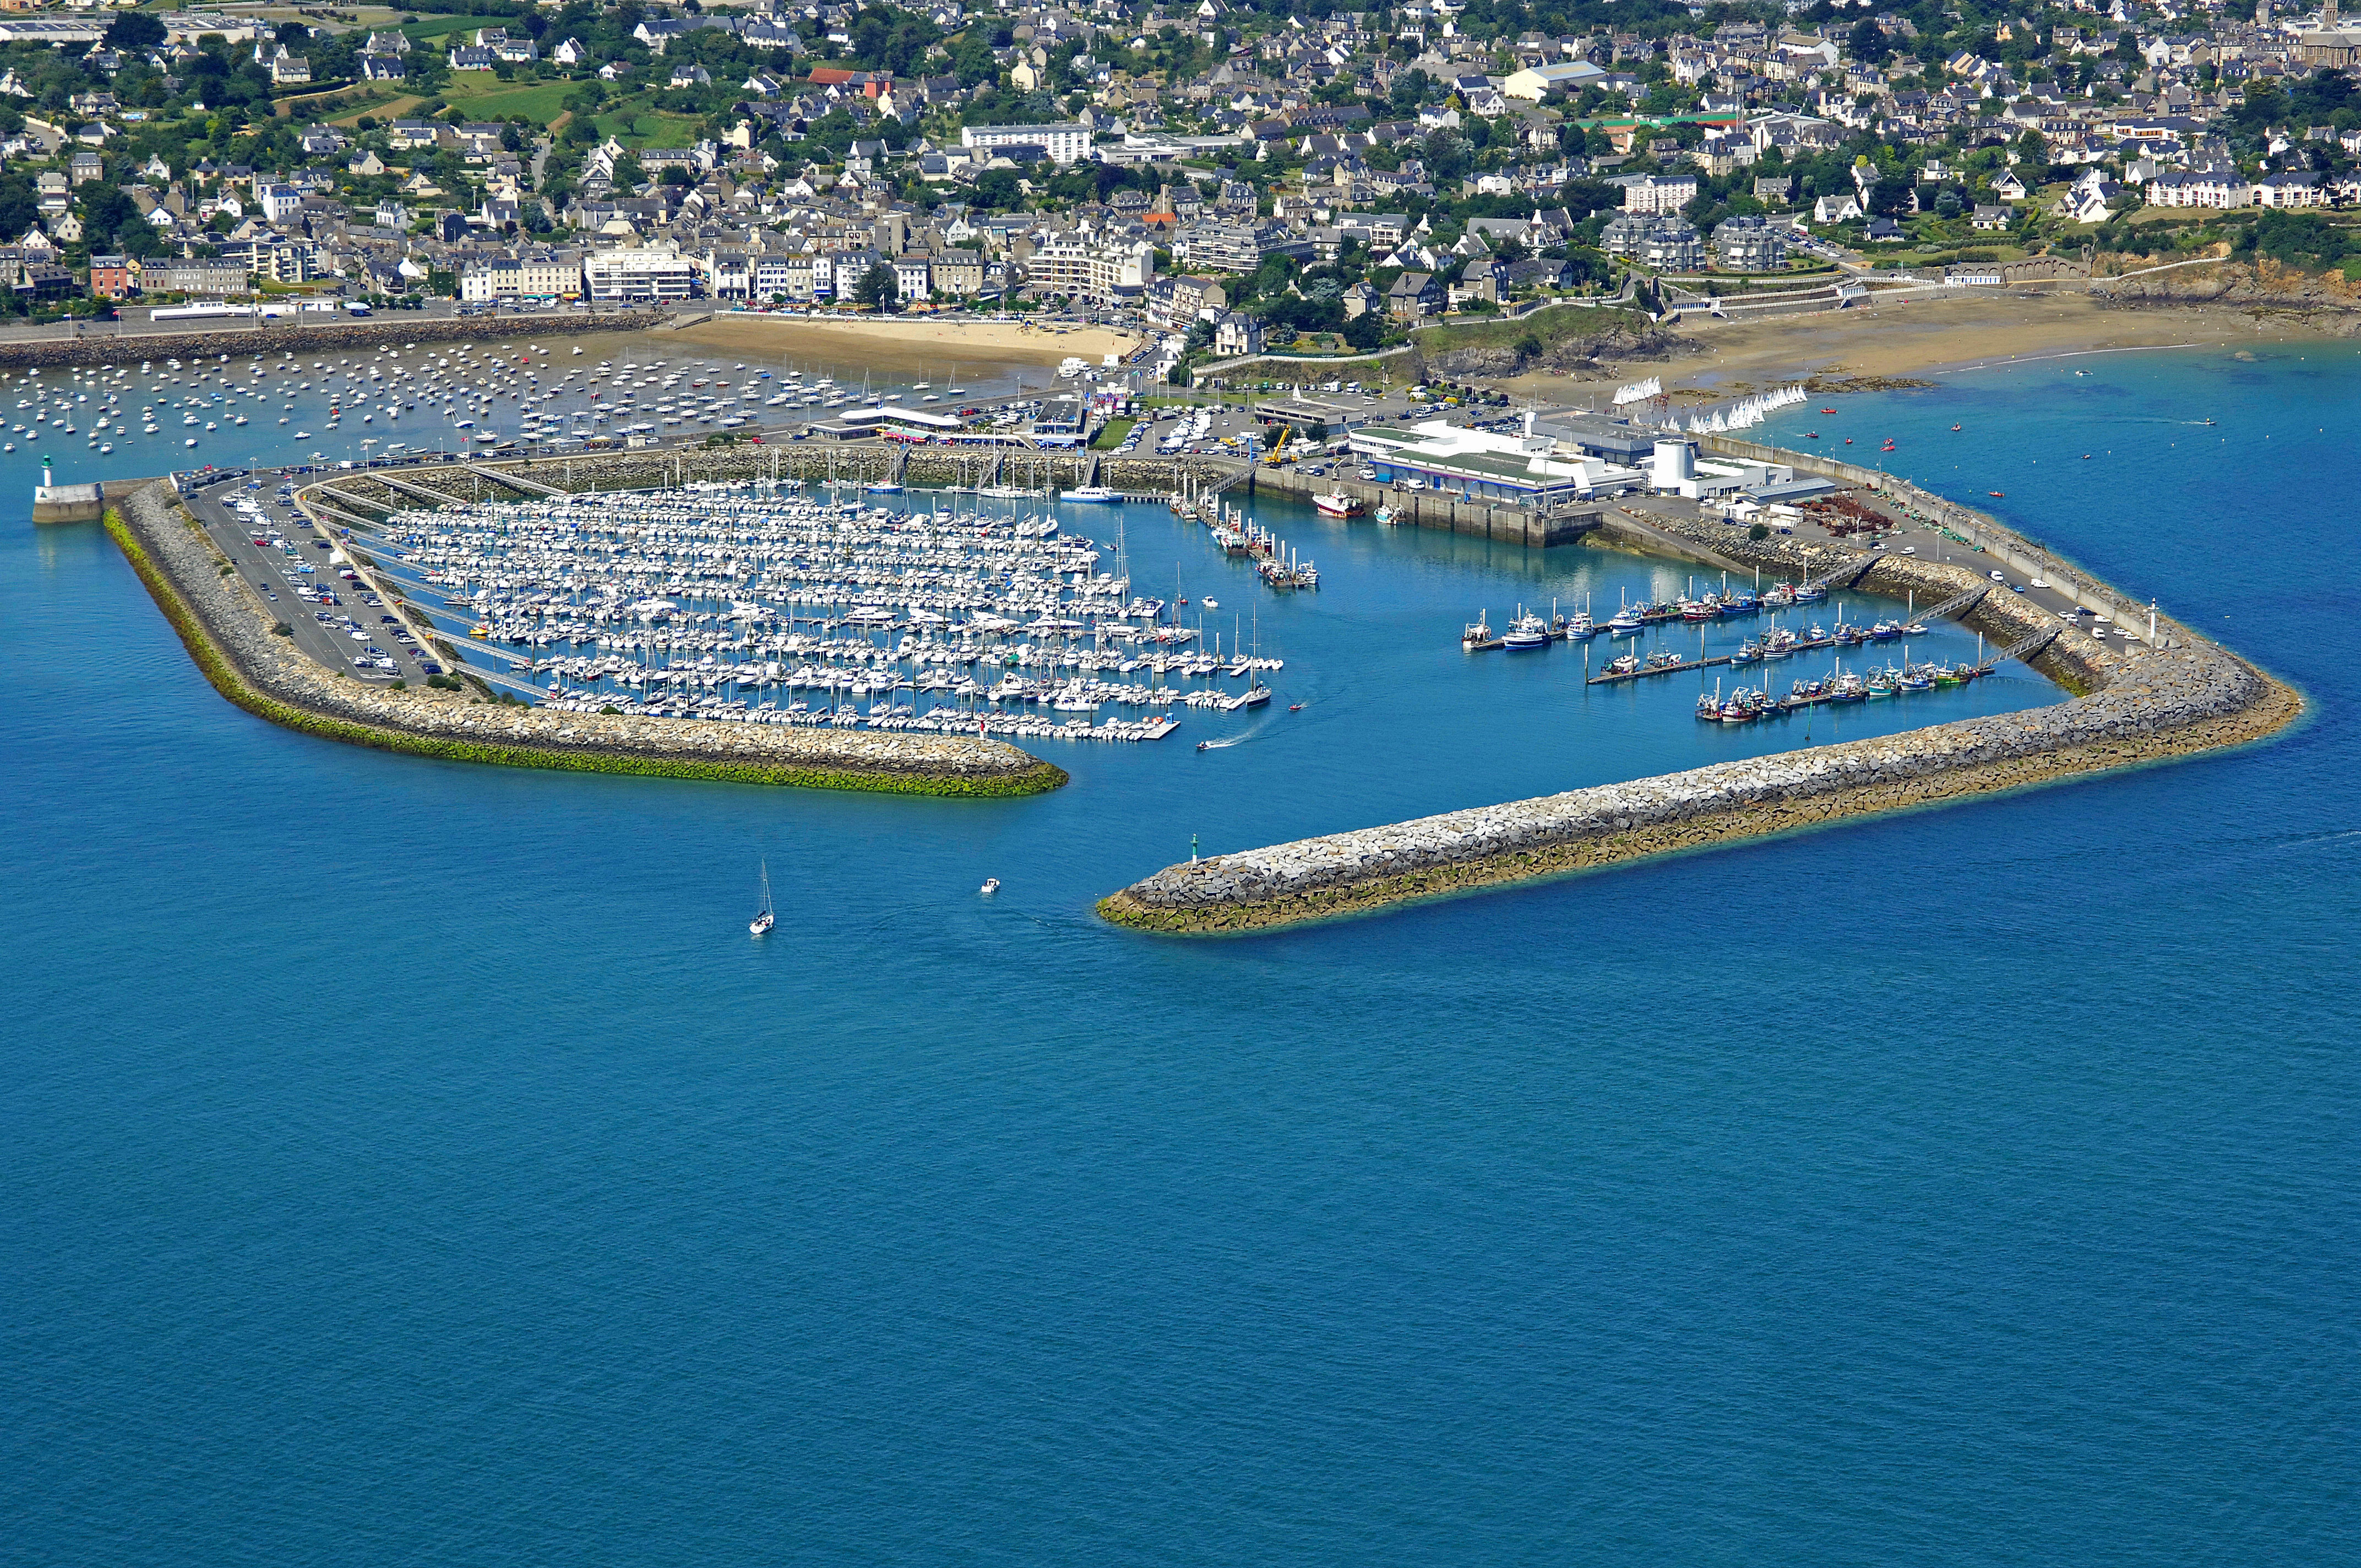 Saint quay port d 39 armor marina in saint quay portrieux - Port de saint quay portrieux ...